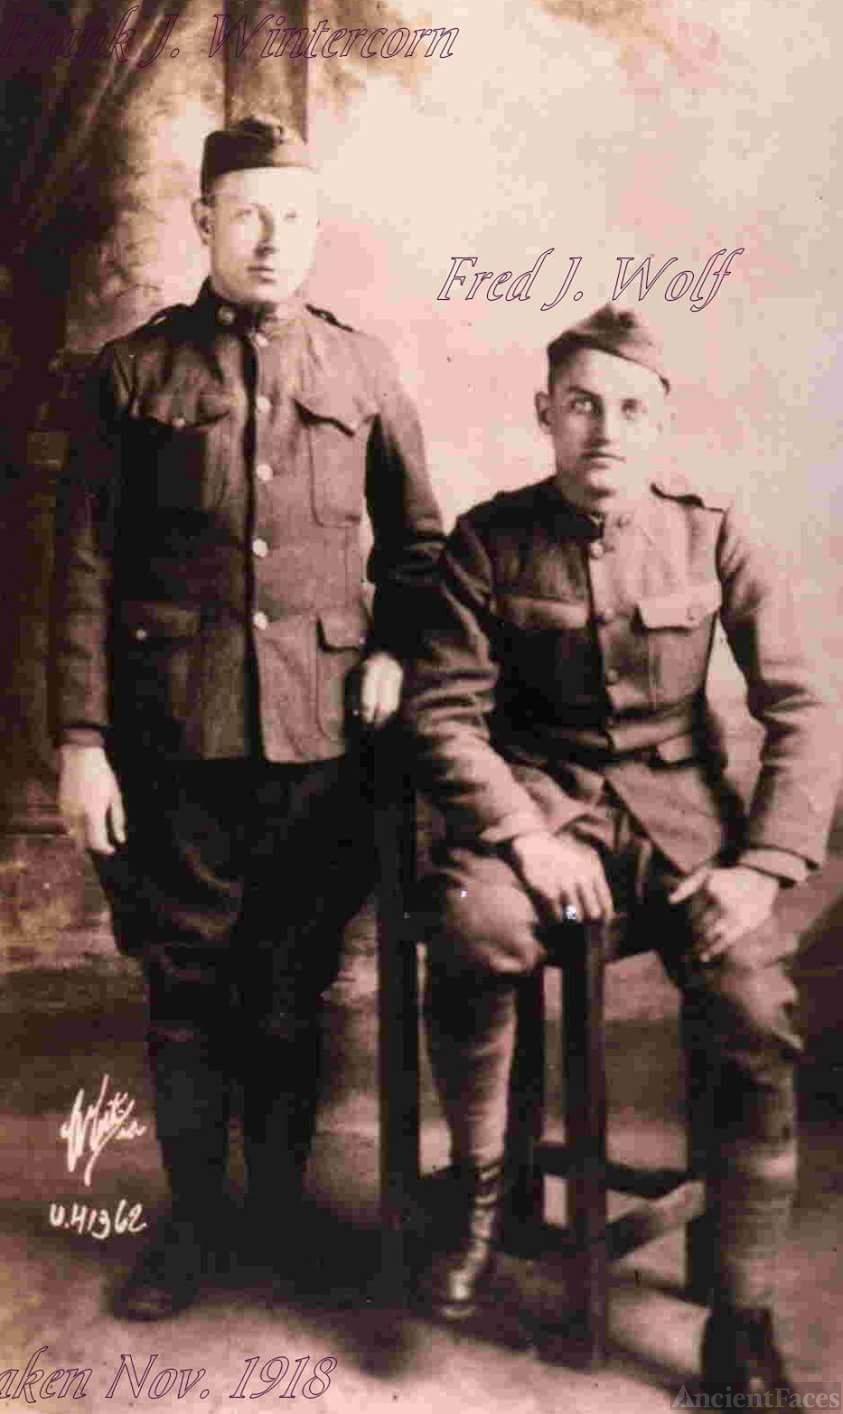 Fred Wolf & Frank Wintercorn